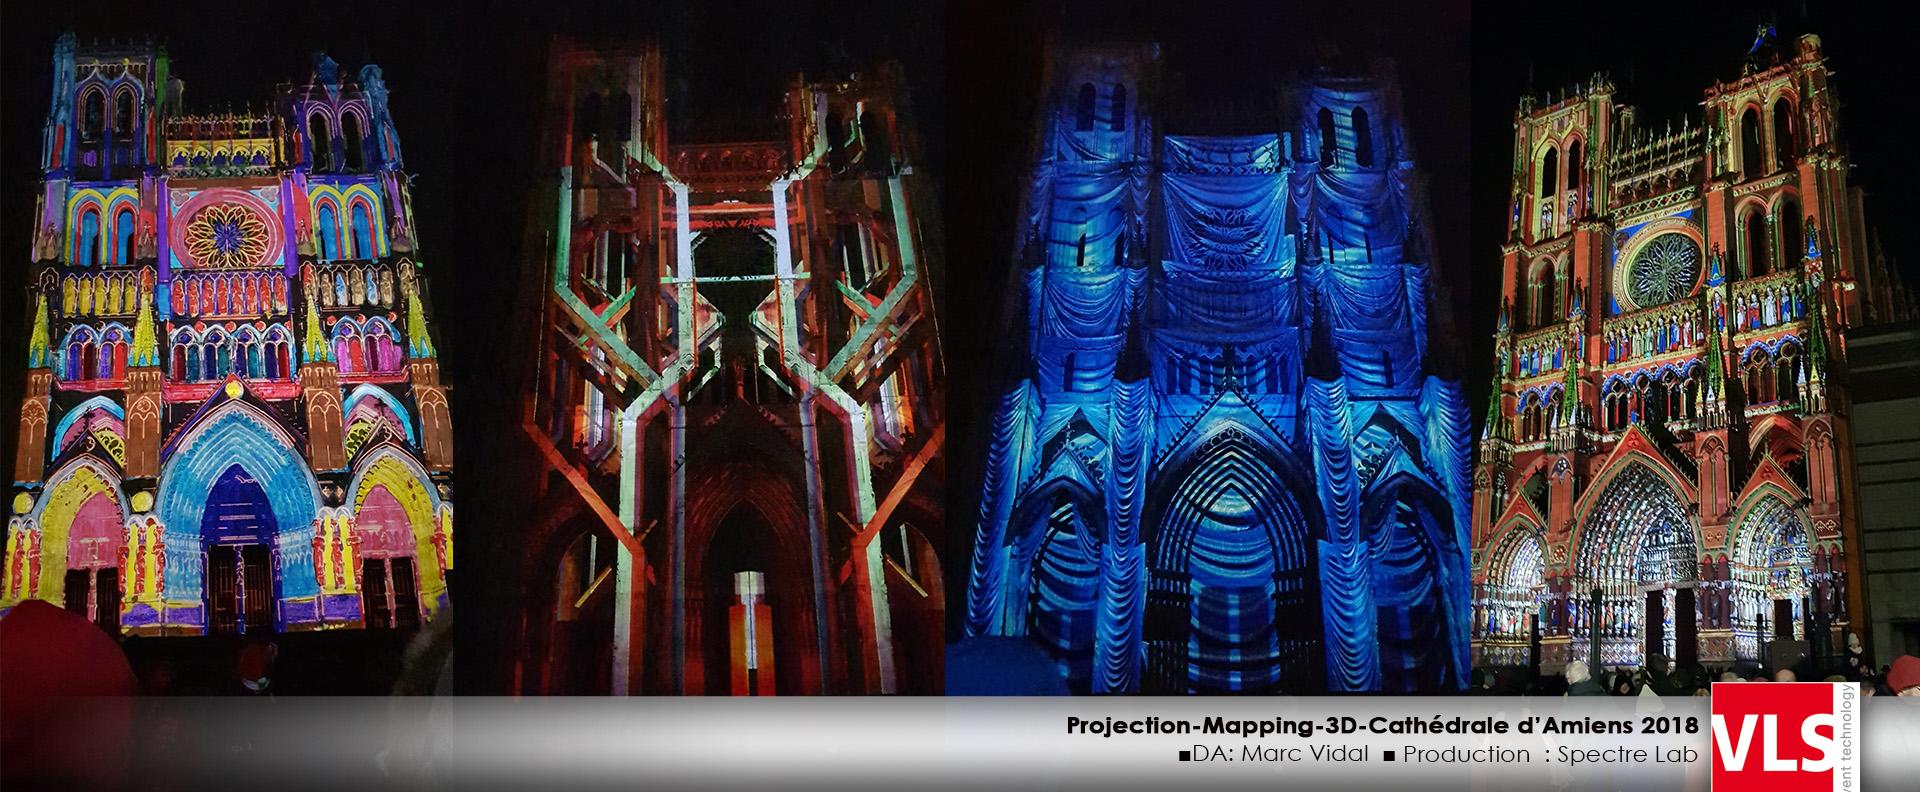 Mapping-3D-Cathédrale-d-Amiens-2018